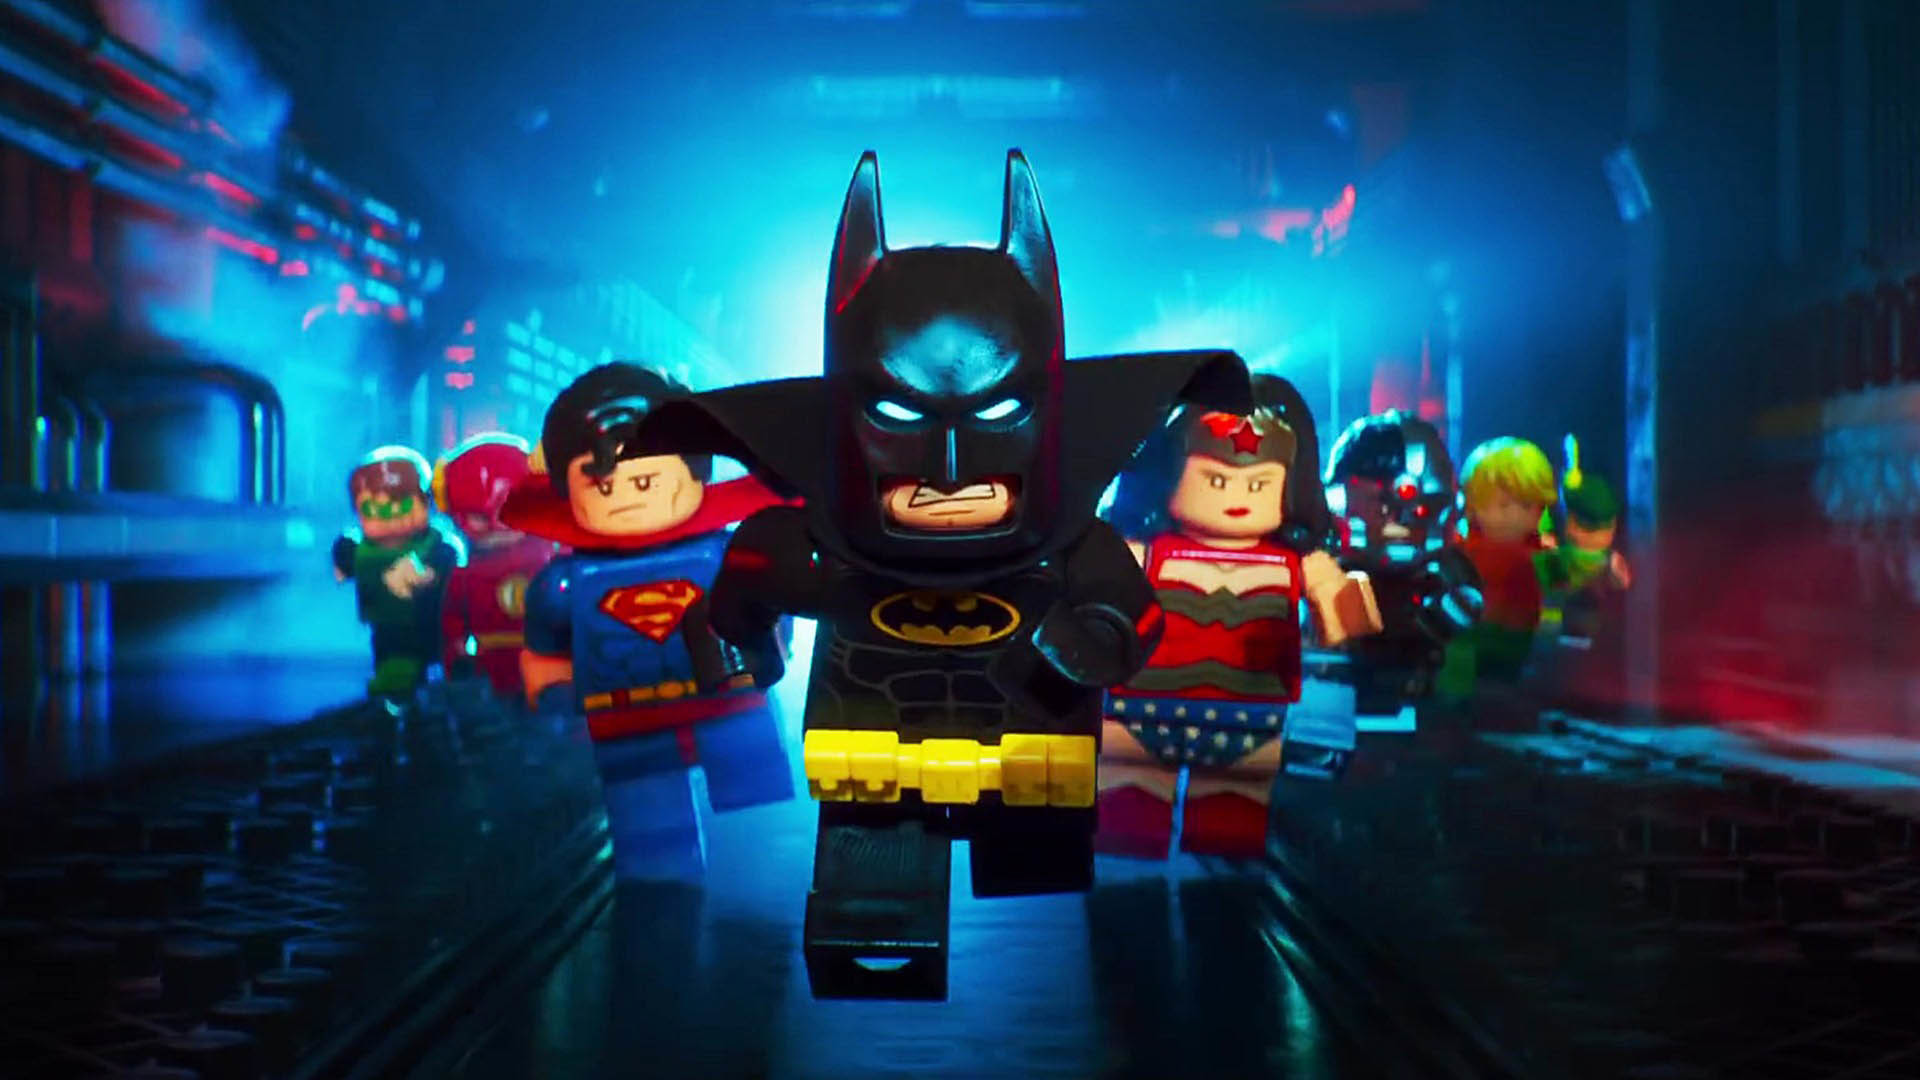 The Lego Batman Movie Wallpaper: Lego Blocks Wallpaper (64+ Images